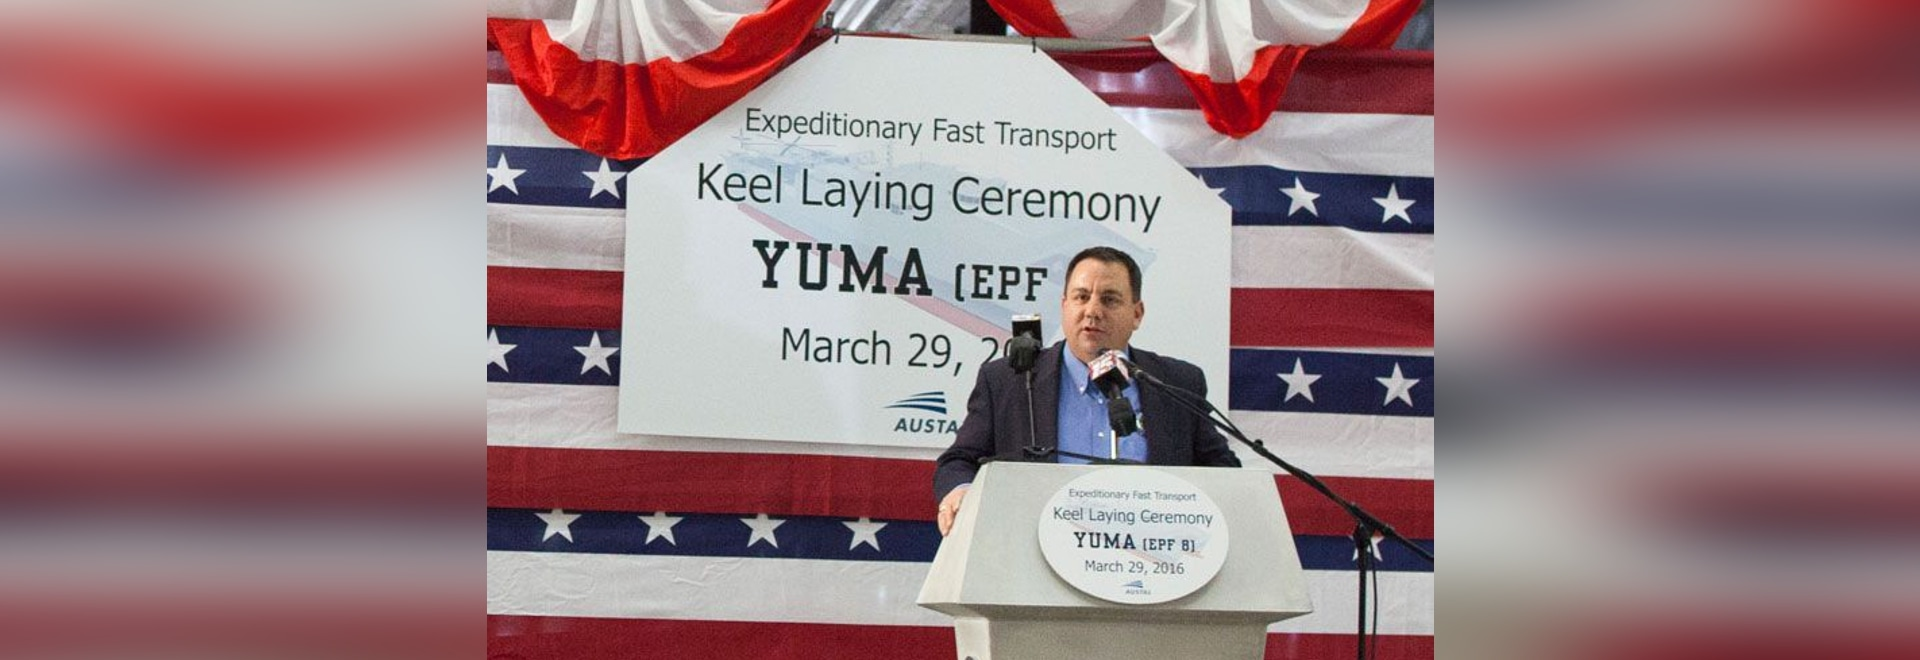 Keel was authenticated by Douglas Nicholls, Mayor of EPF 8's namesake city, Yuma, AZ